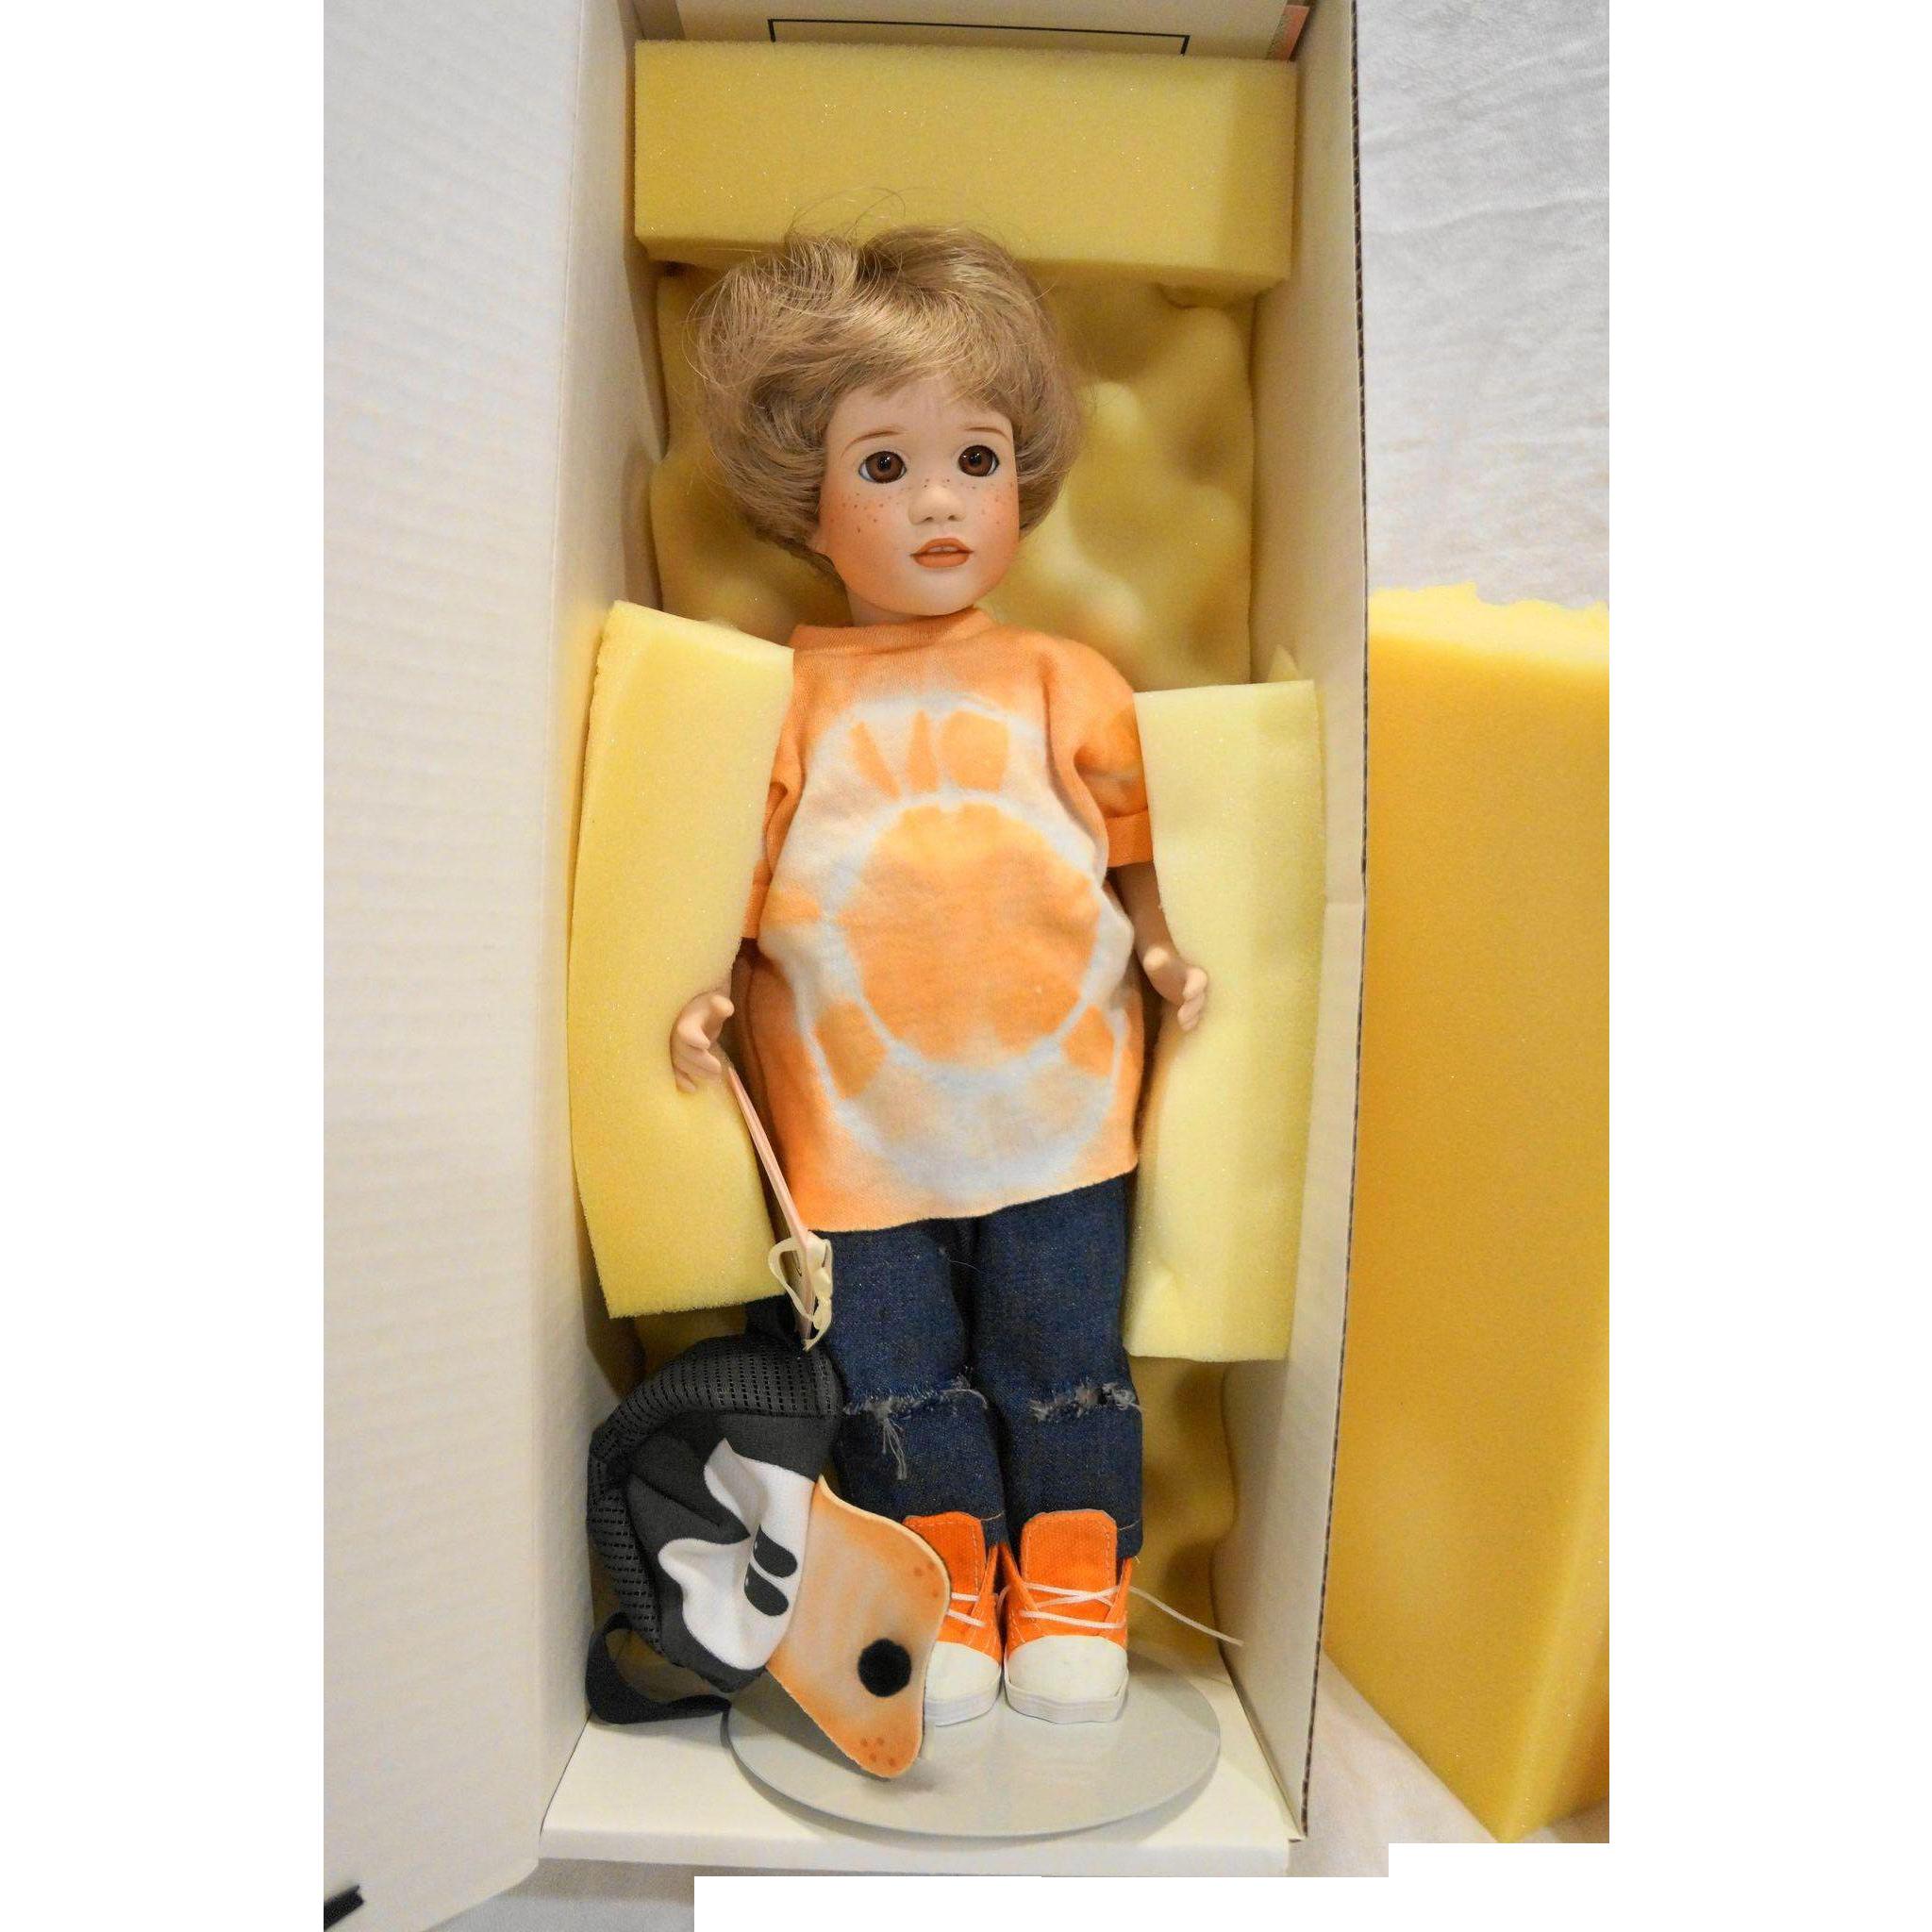 Lawton Doll A Goofy Little Kid NIB MIB Ltd Ed 100 AP/1 1993 Disney World